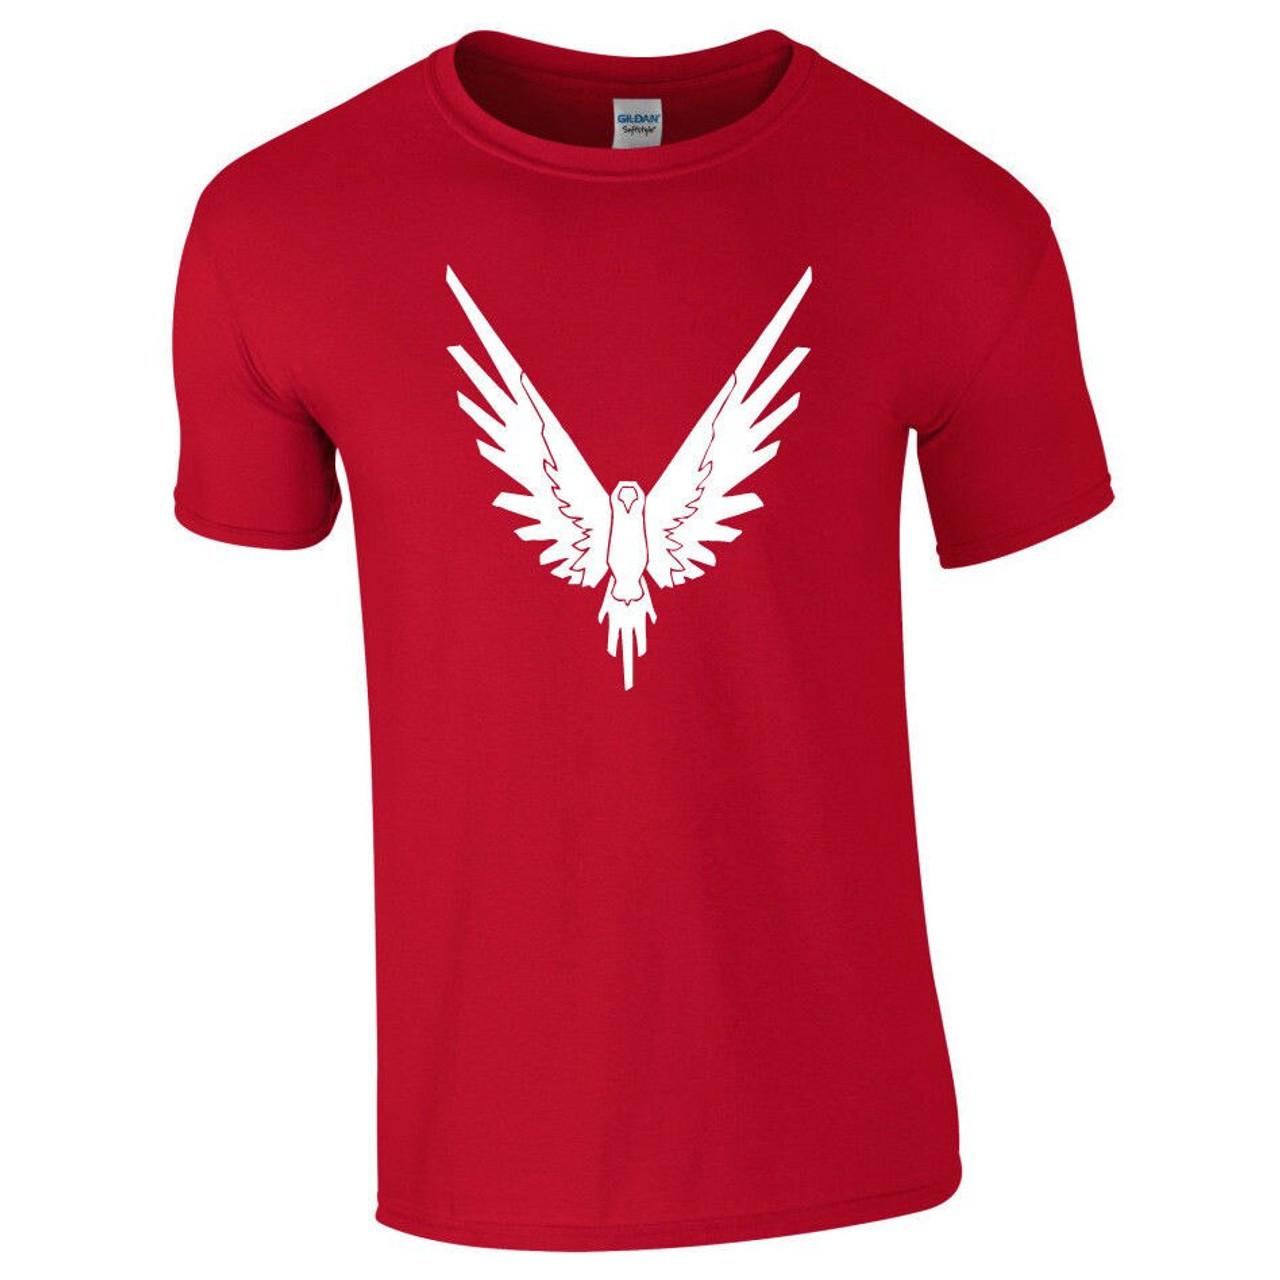 Kids Adults LOGANG Inspired Logan Jake Paul Youtuber Tshirt Top Team 10 Gift